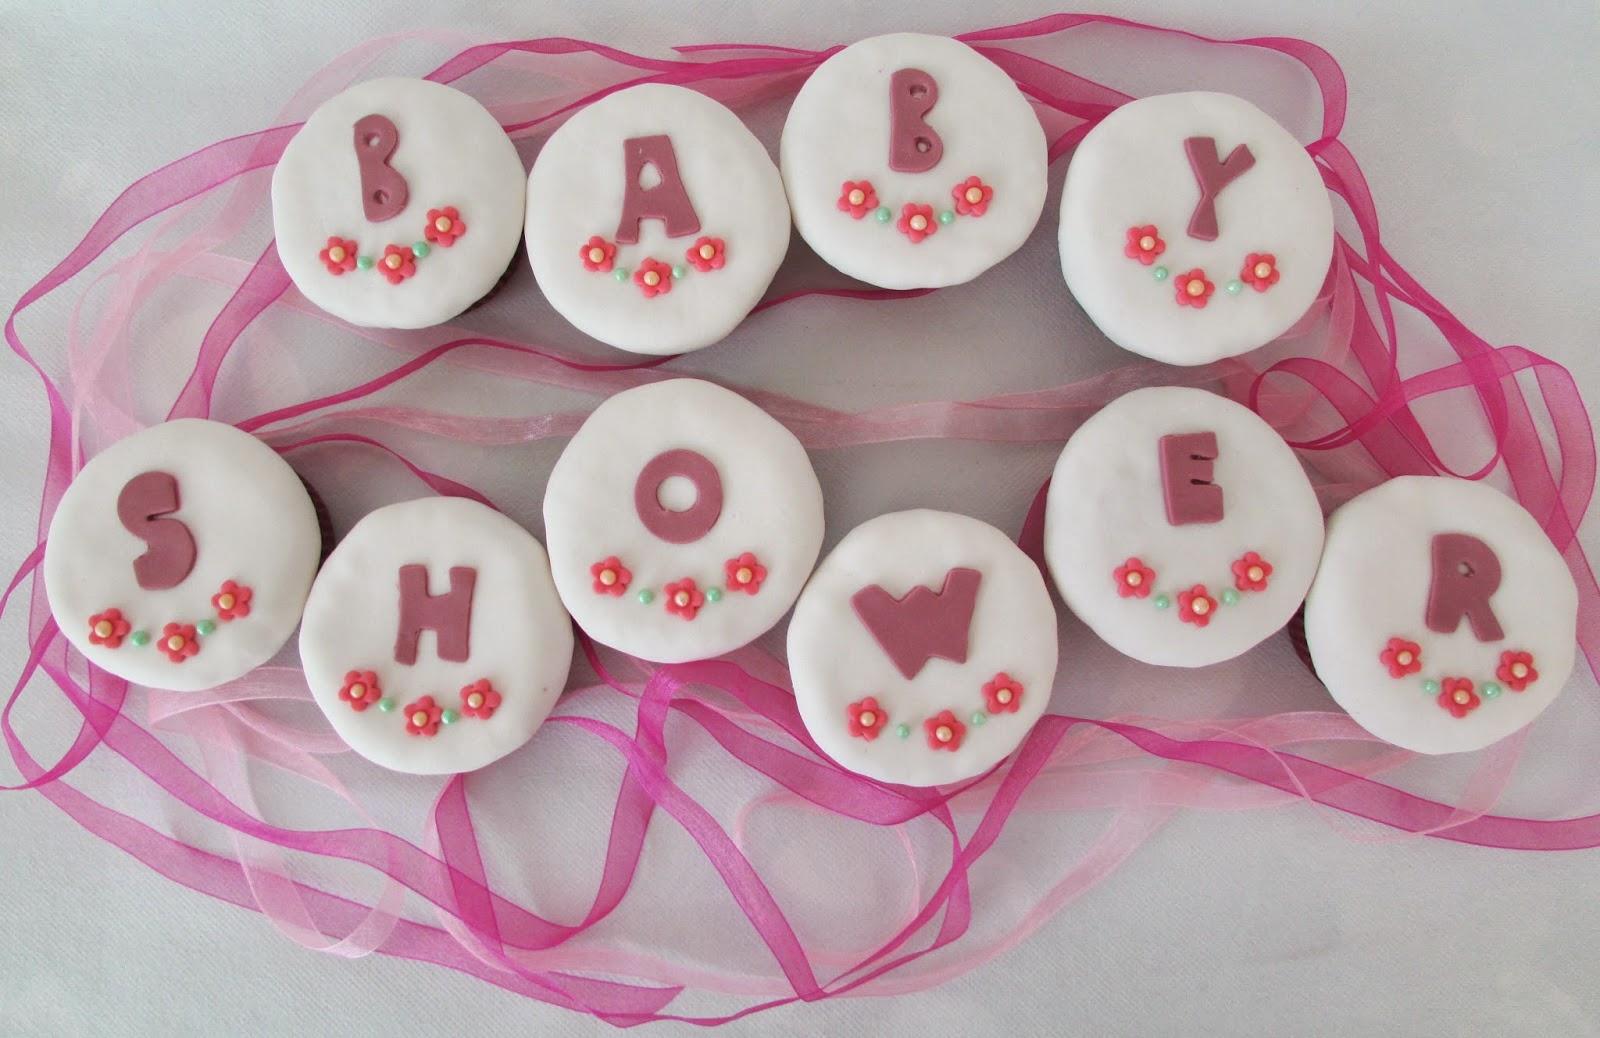 BabyShower-cupcakes-letras-fondat